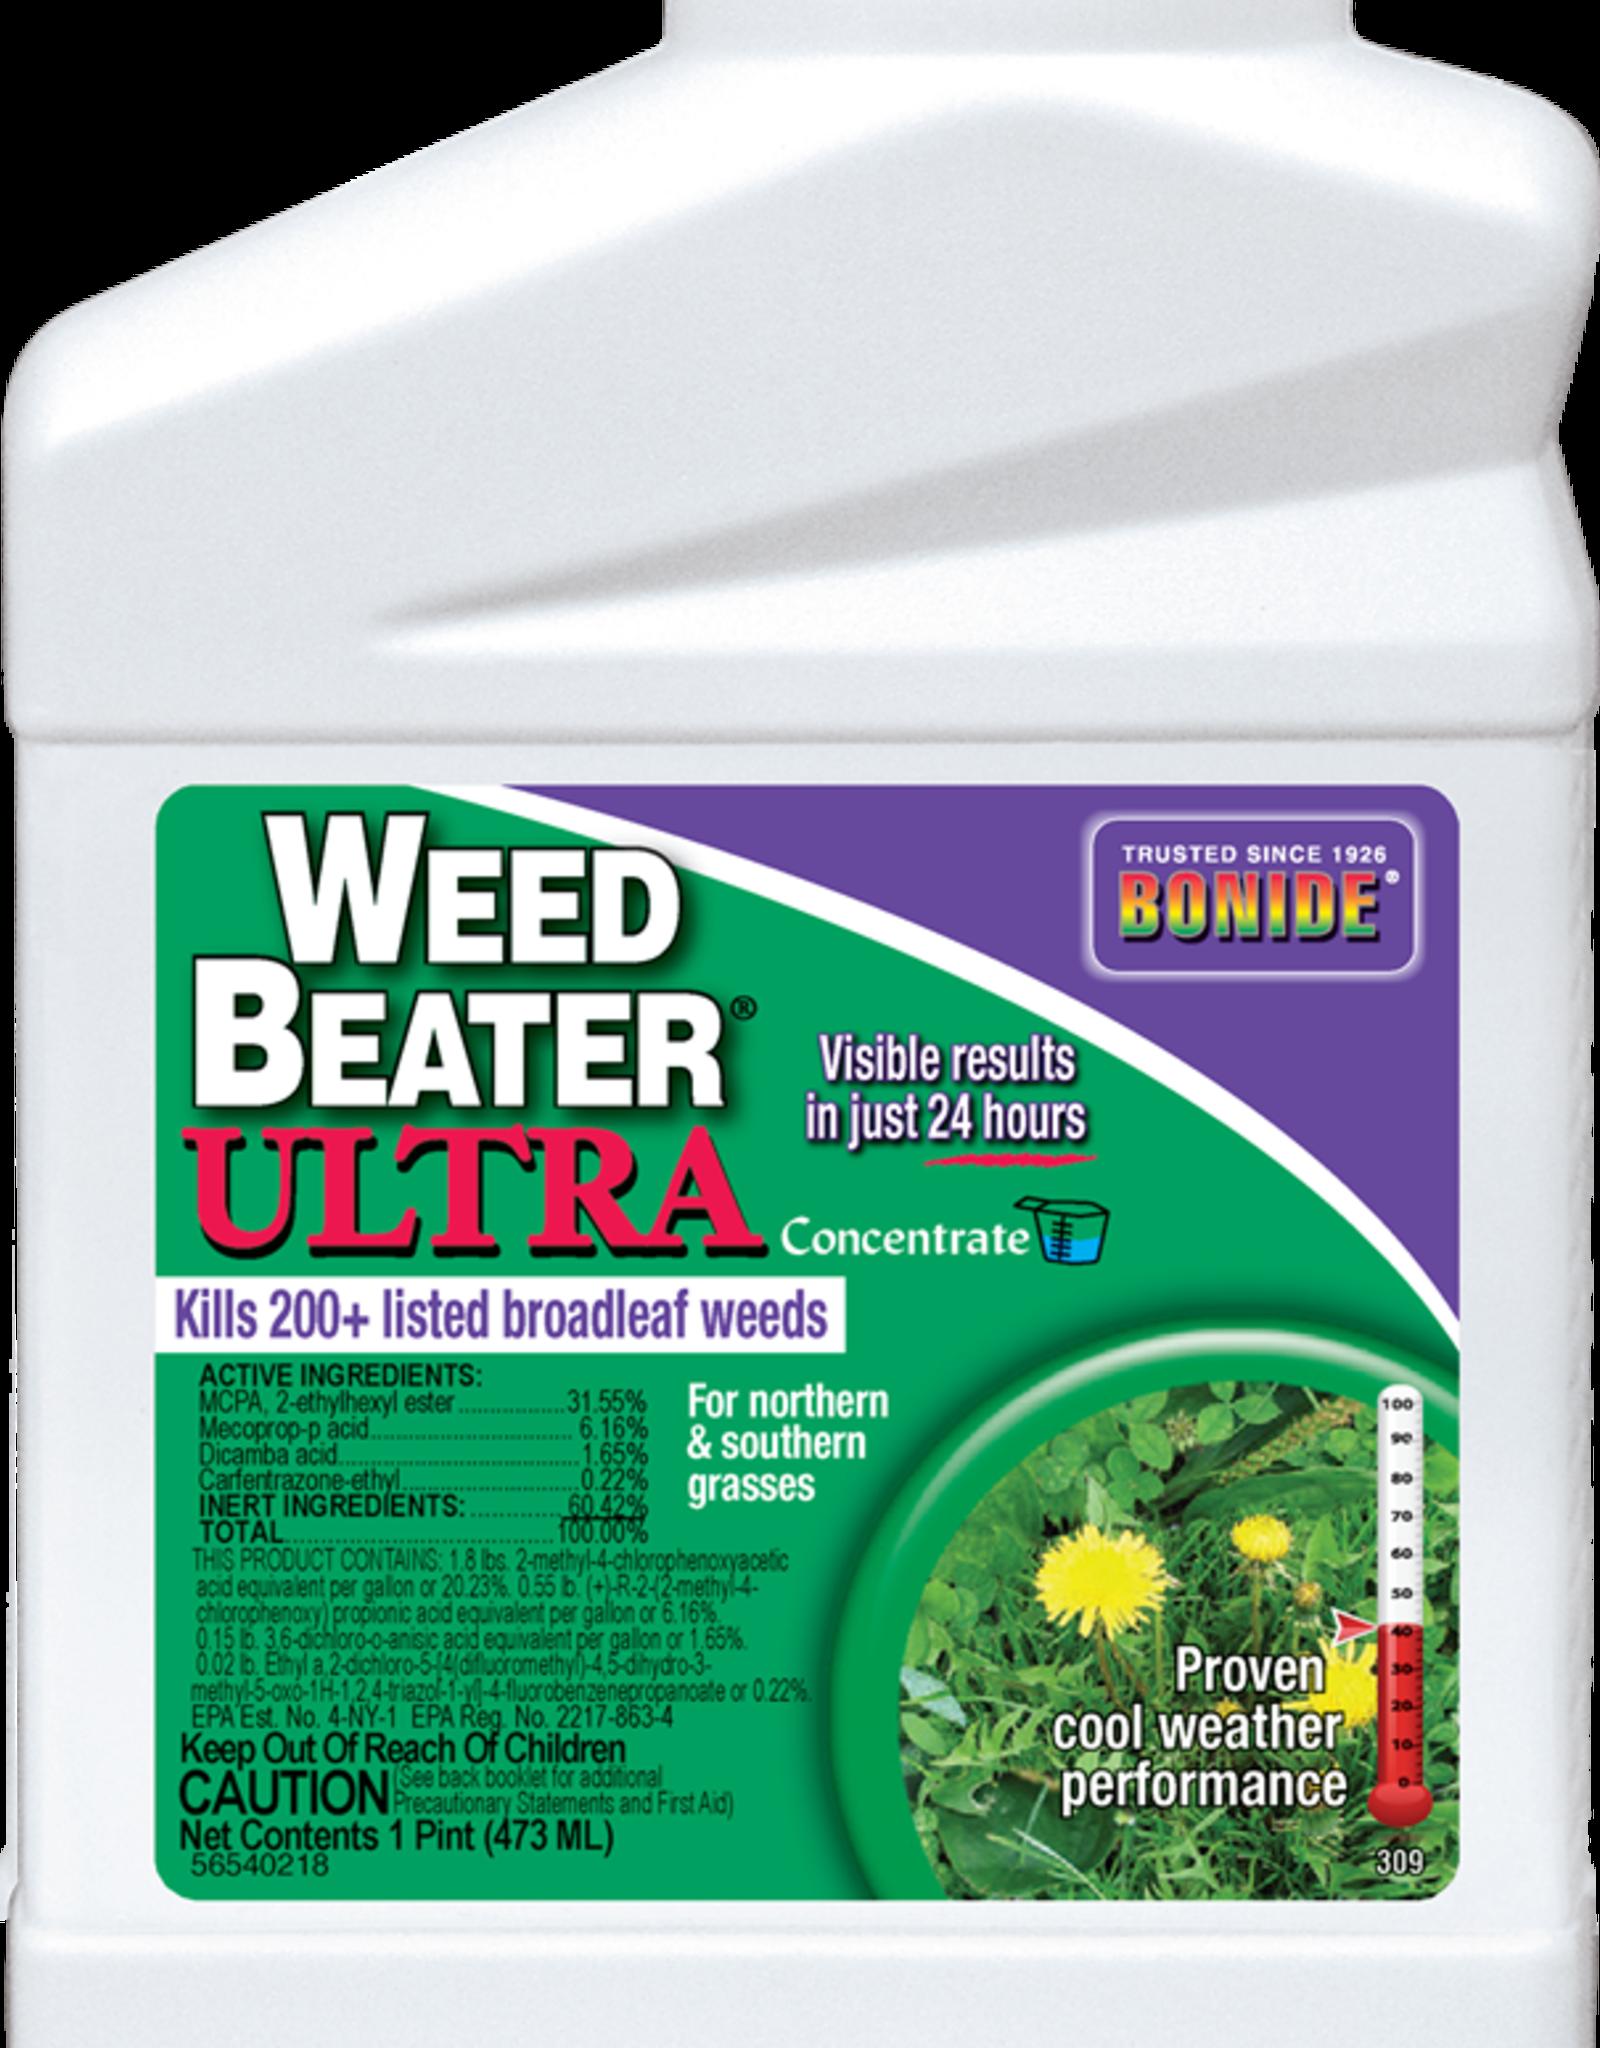 BONIDE PRODUCTS INC     P BONIDE WEED BEATER ULTRA CONC 16OZ